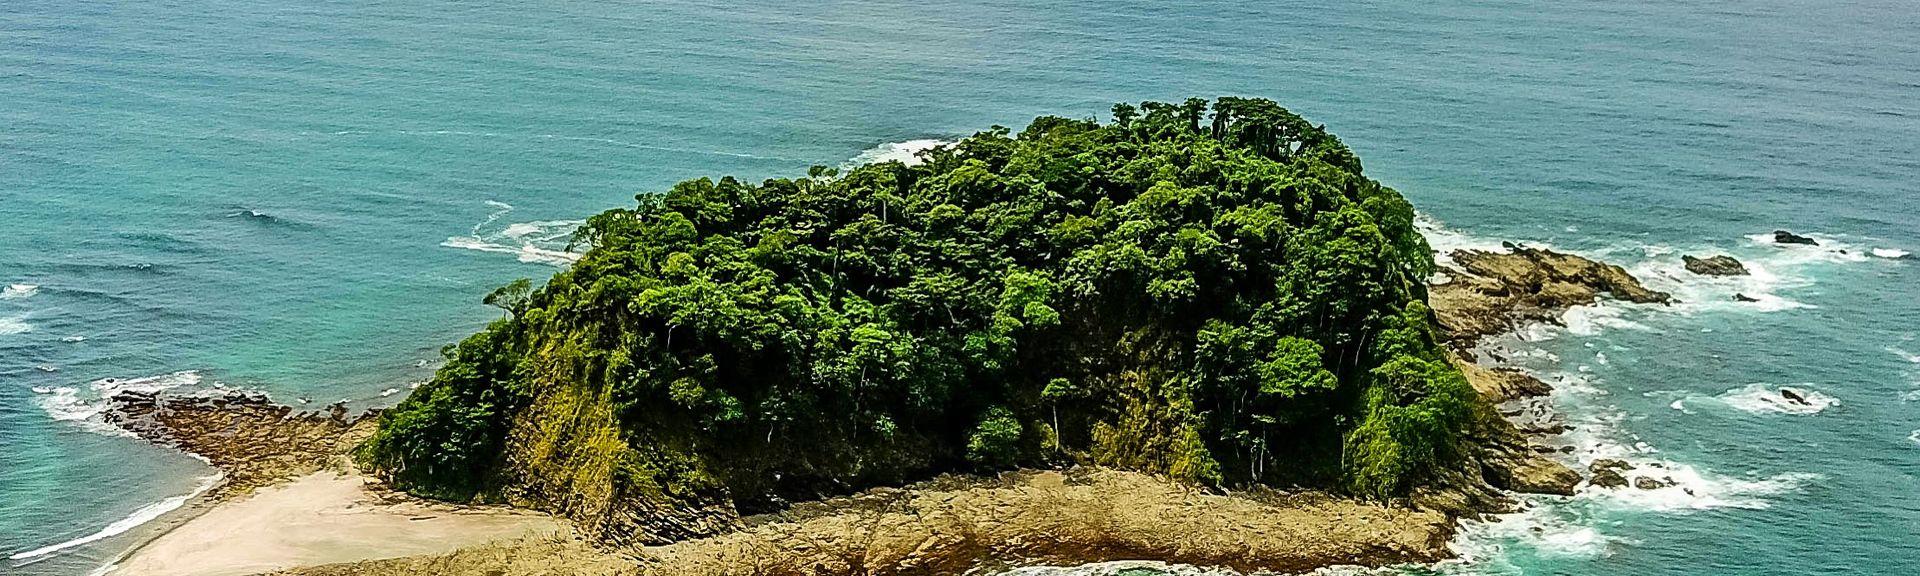 Samara, Provinz Guanacaste, Costa Rica